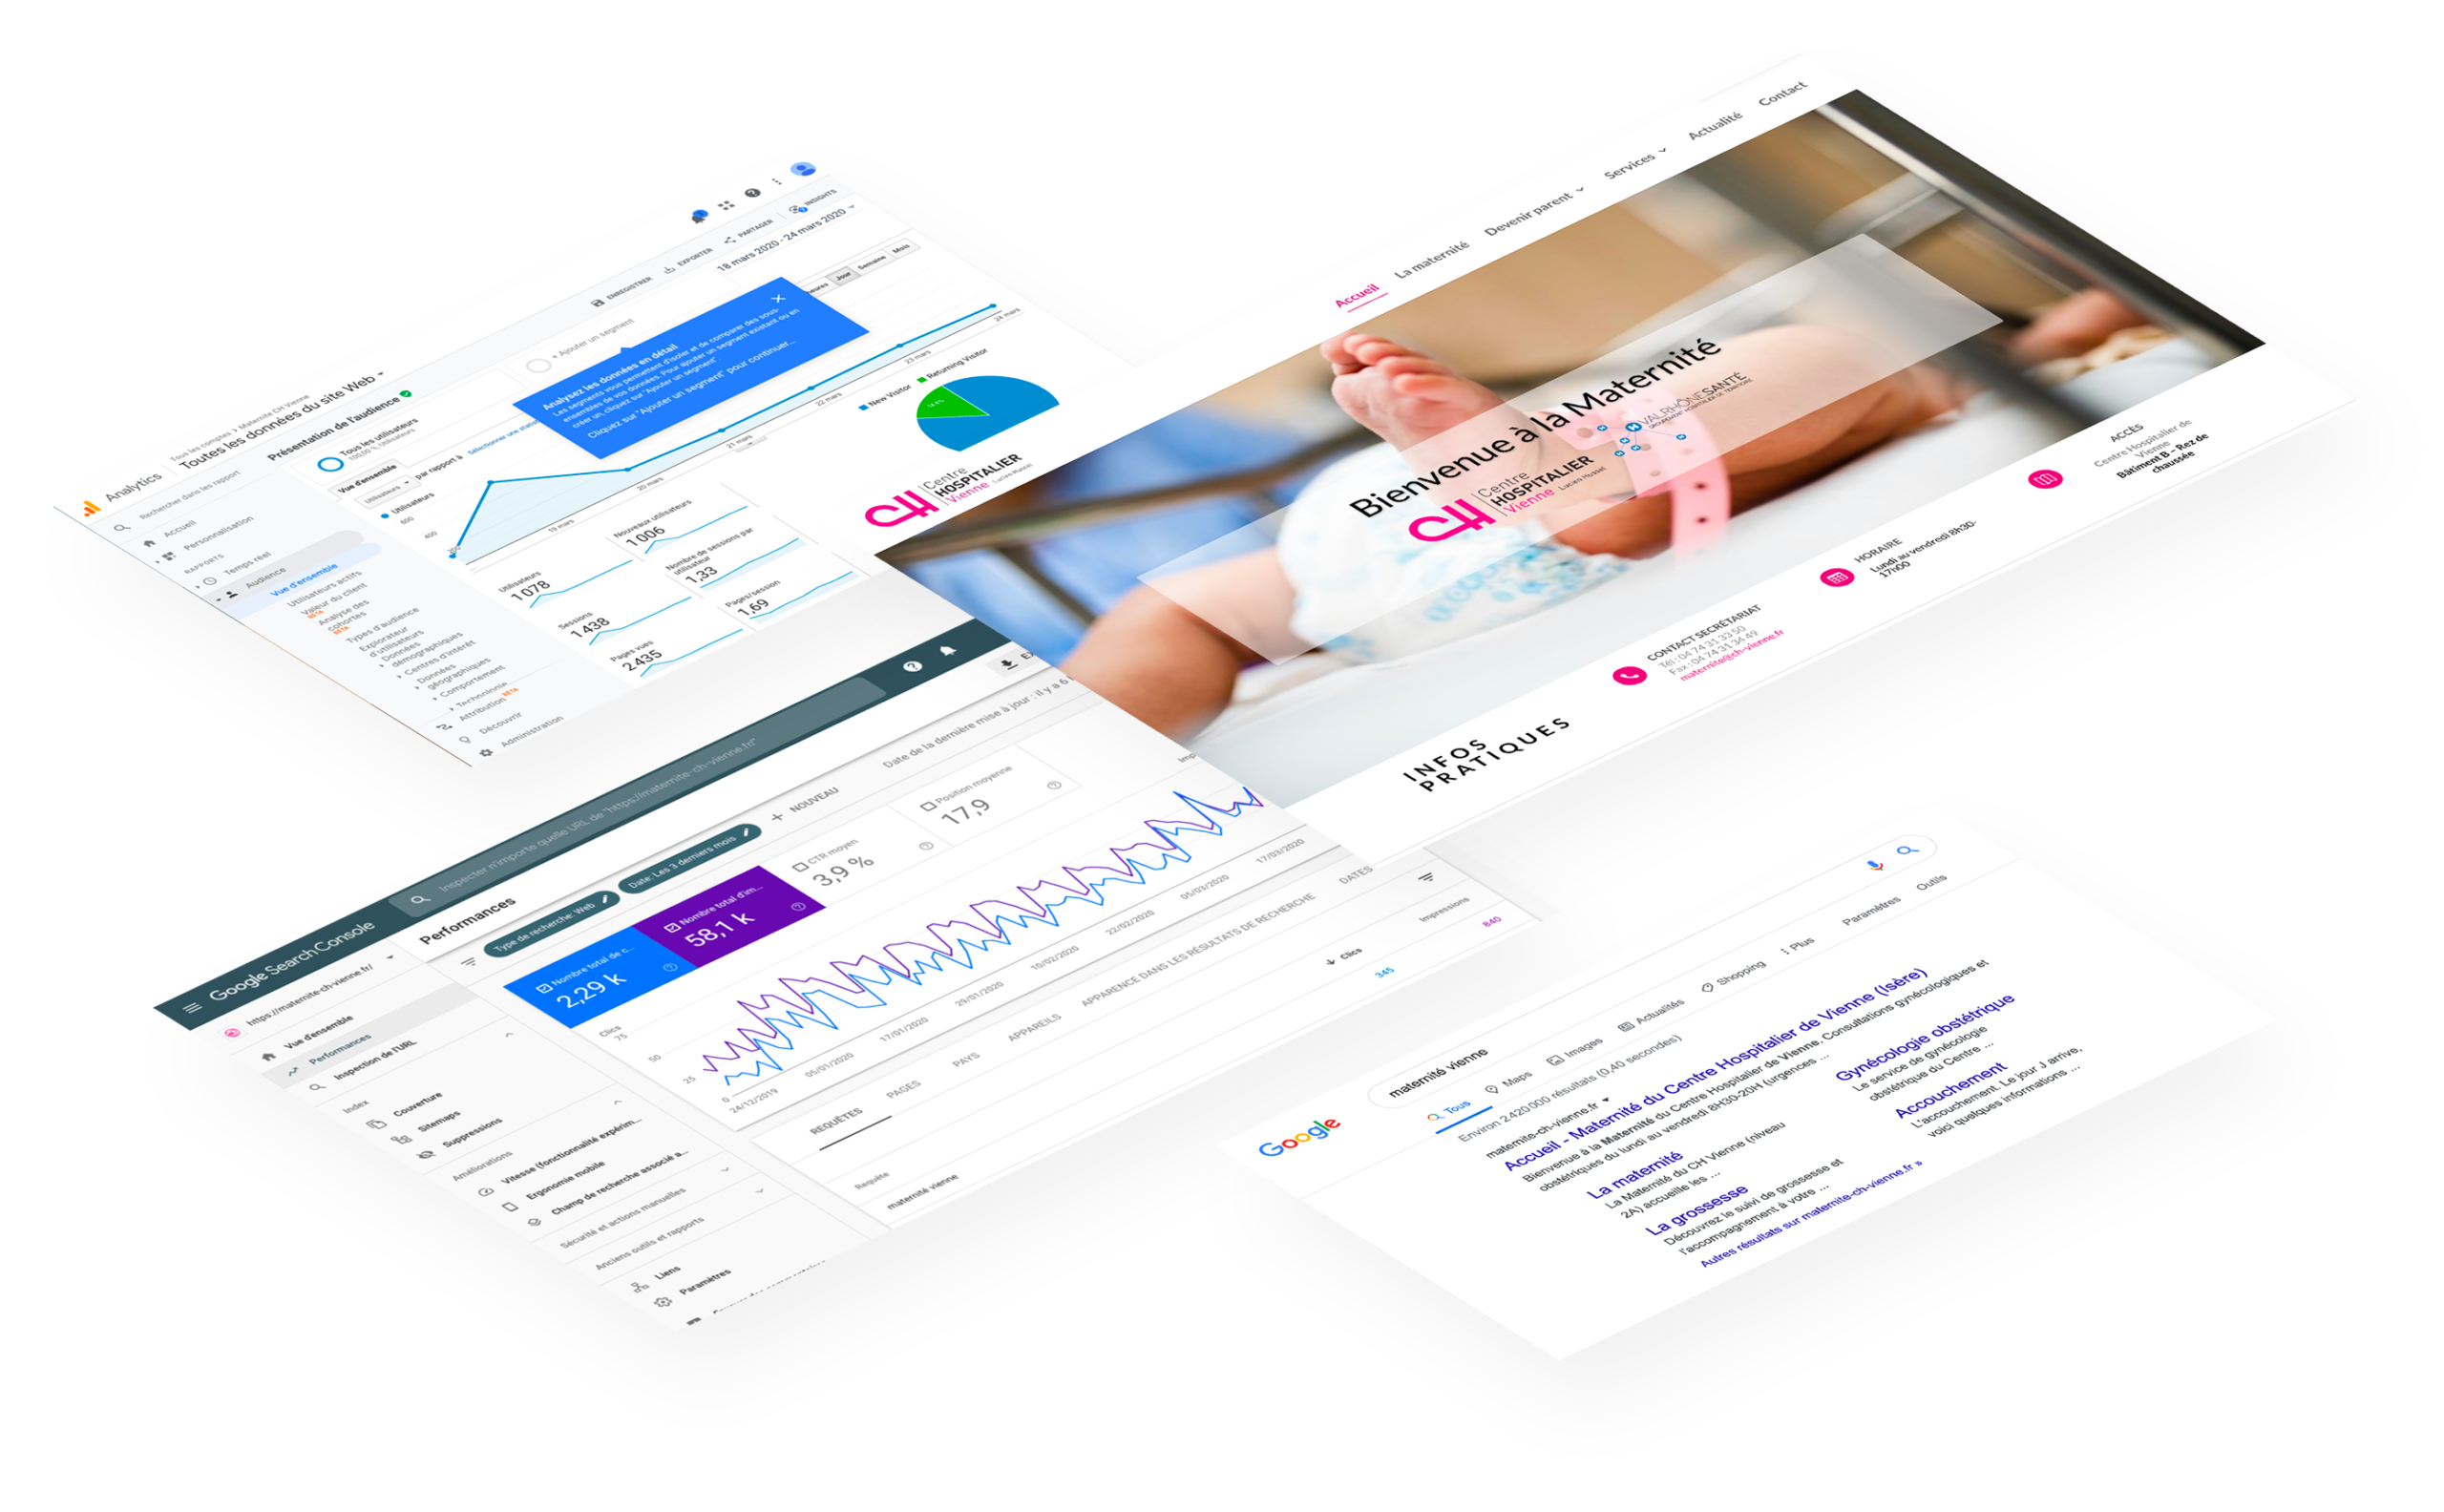 test seo - Web at Heart, agence digitale à Lyon